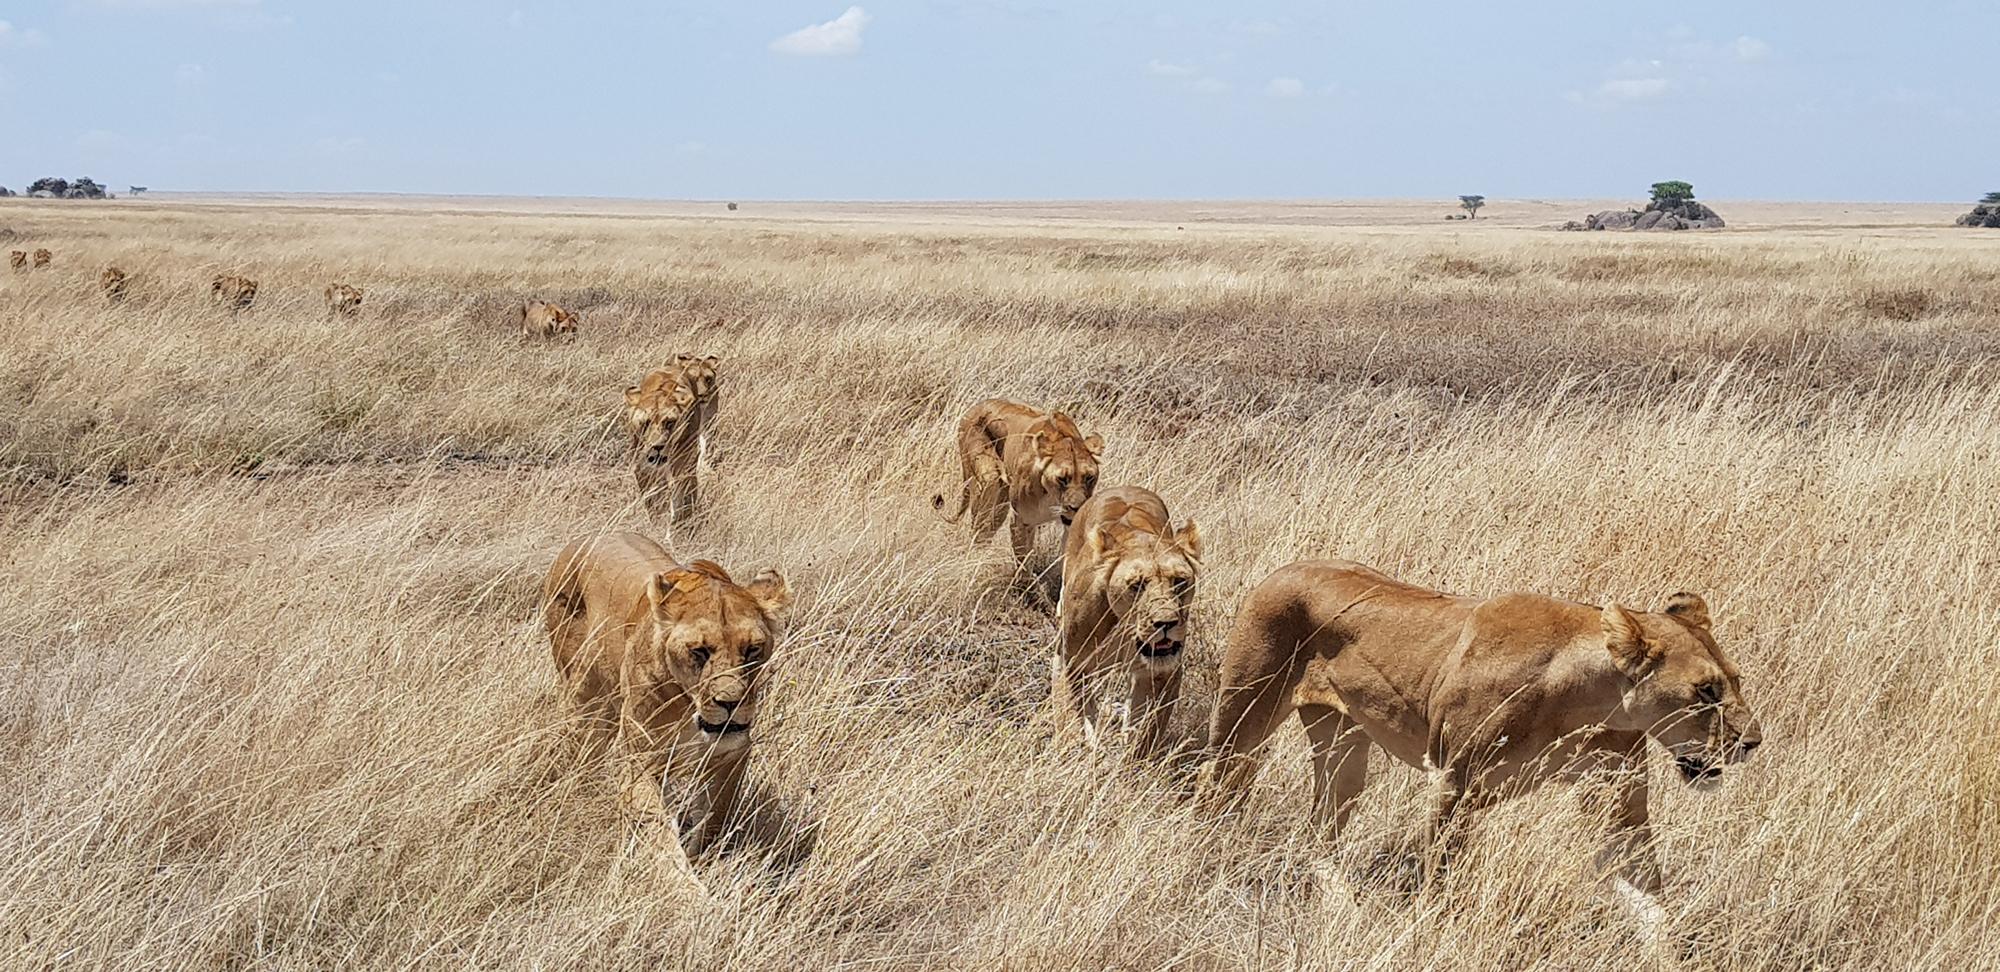 Pride of lions walking through grasslands of Serengeti